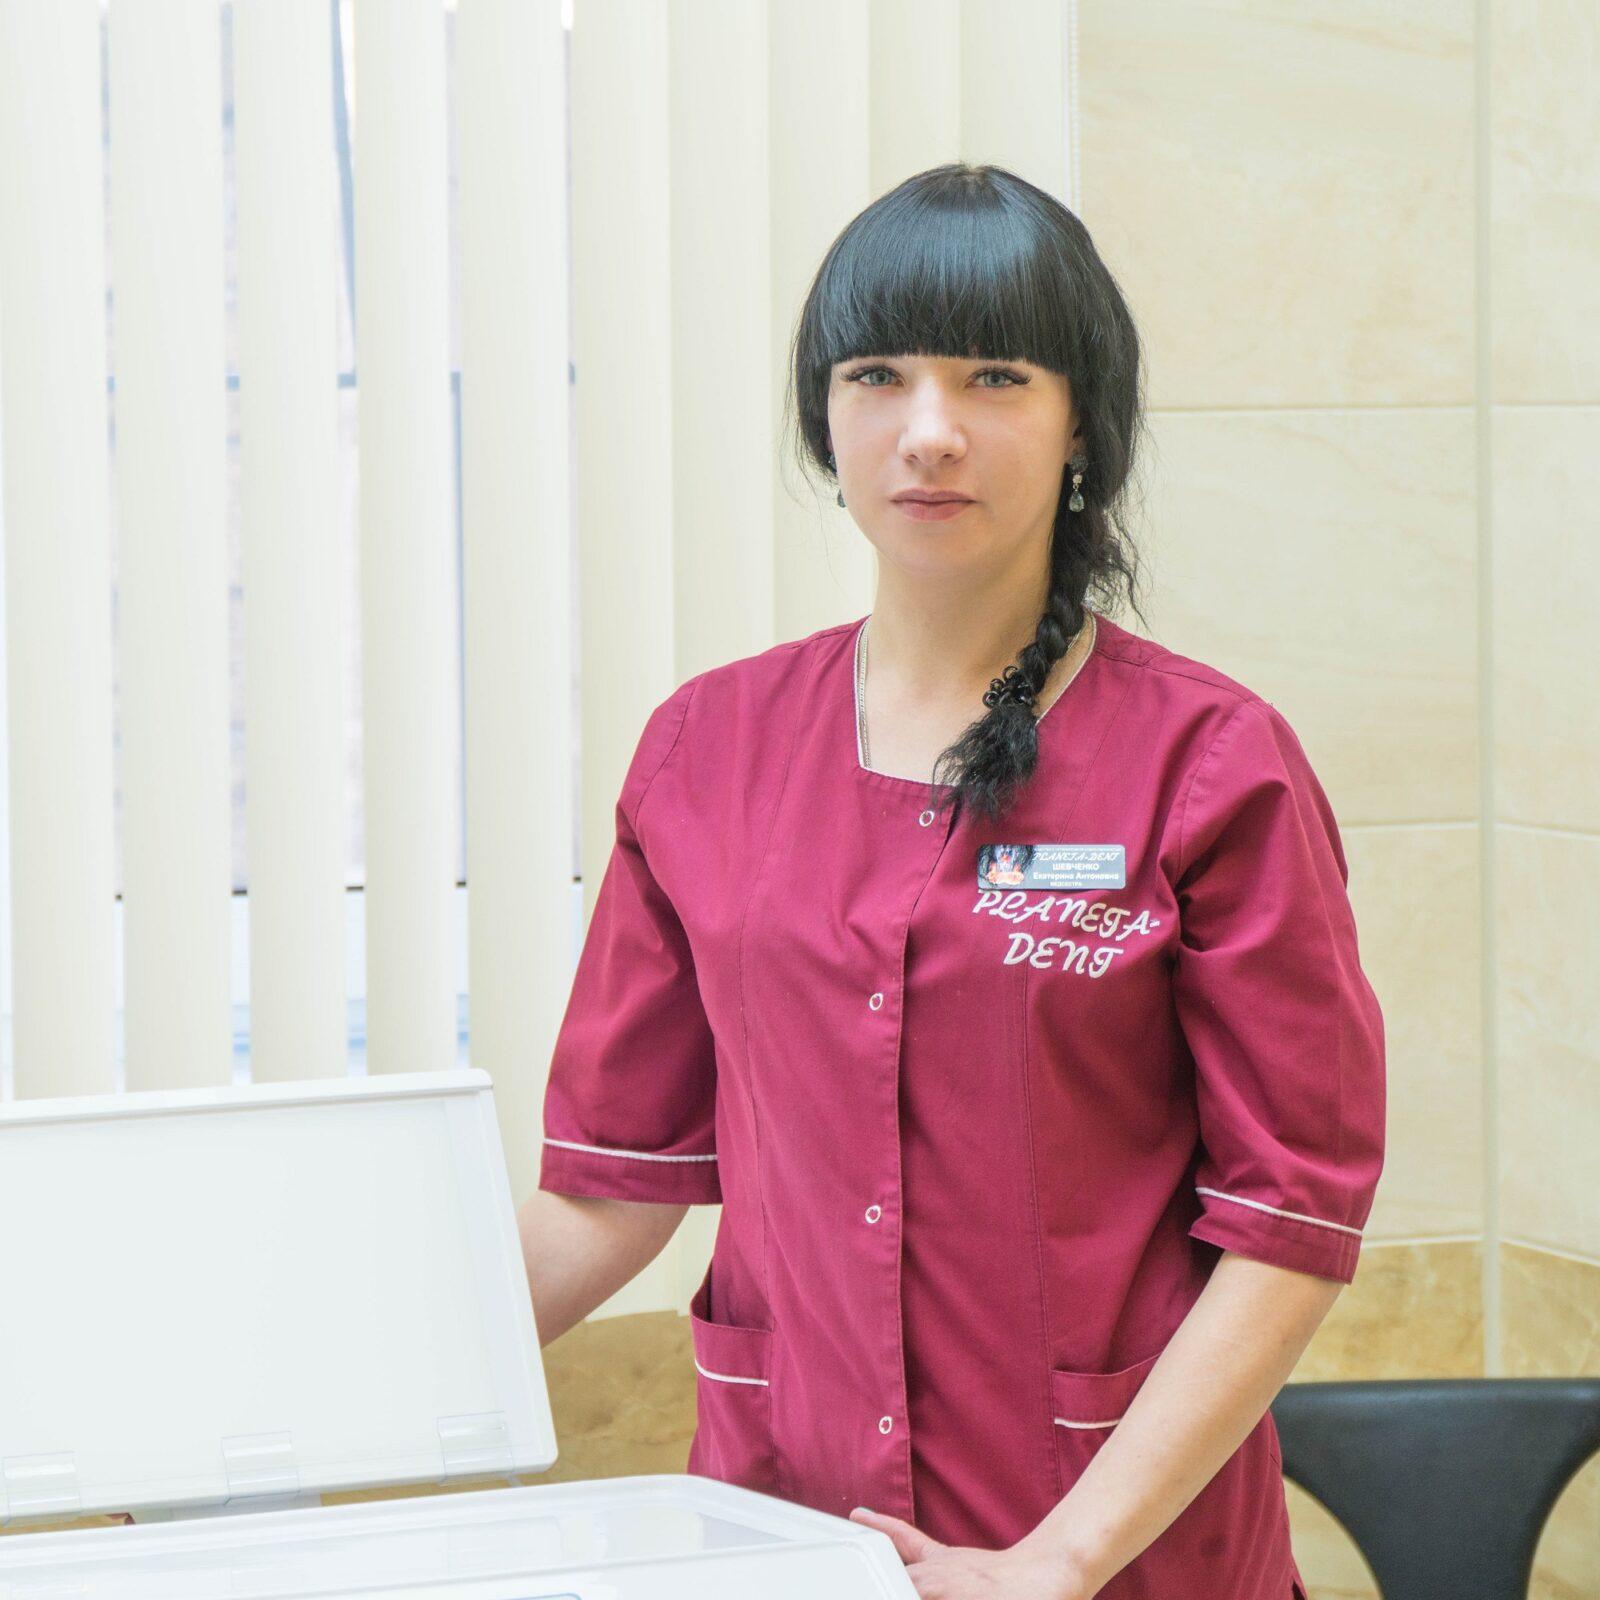 Шевченко Екатерина Антоновна